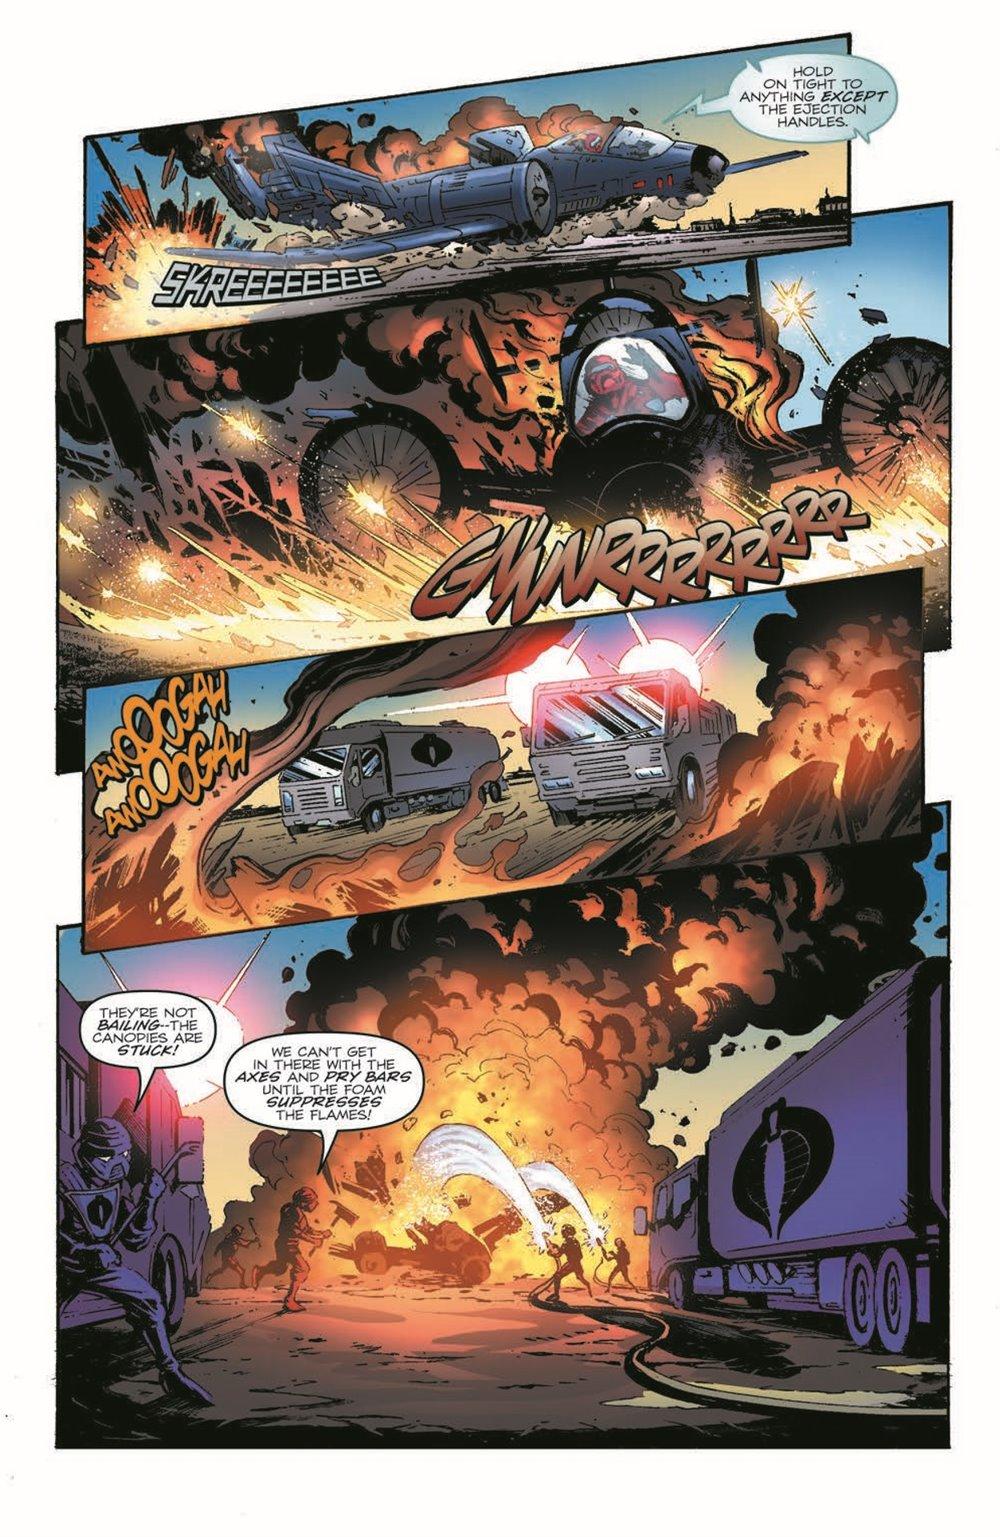 GIJoeRAH280-pr-6 ComicList Previews: G.I. JOE A REAL AMERICAN HERO #280